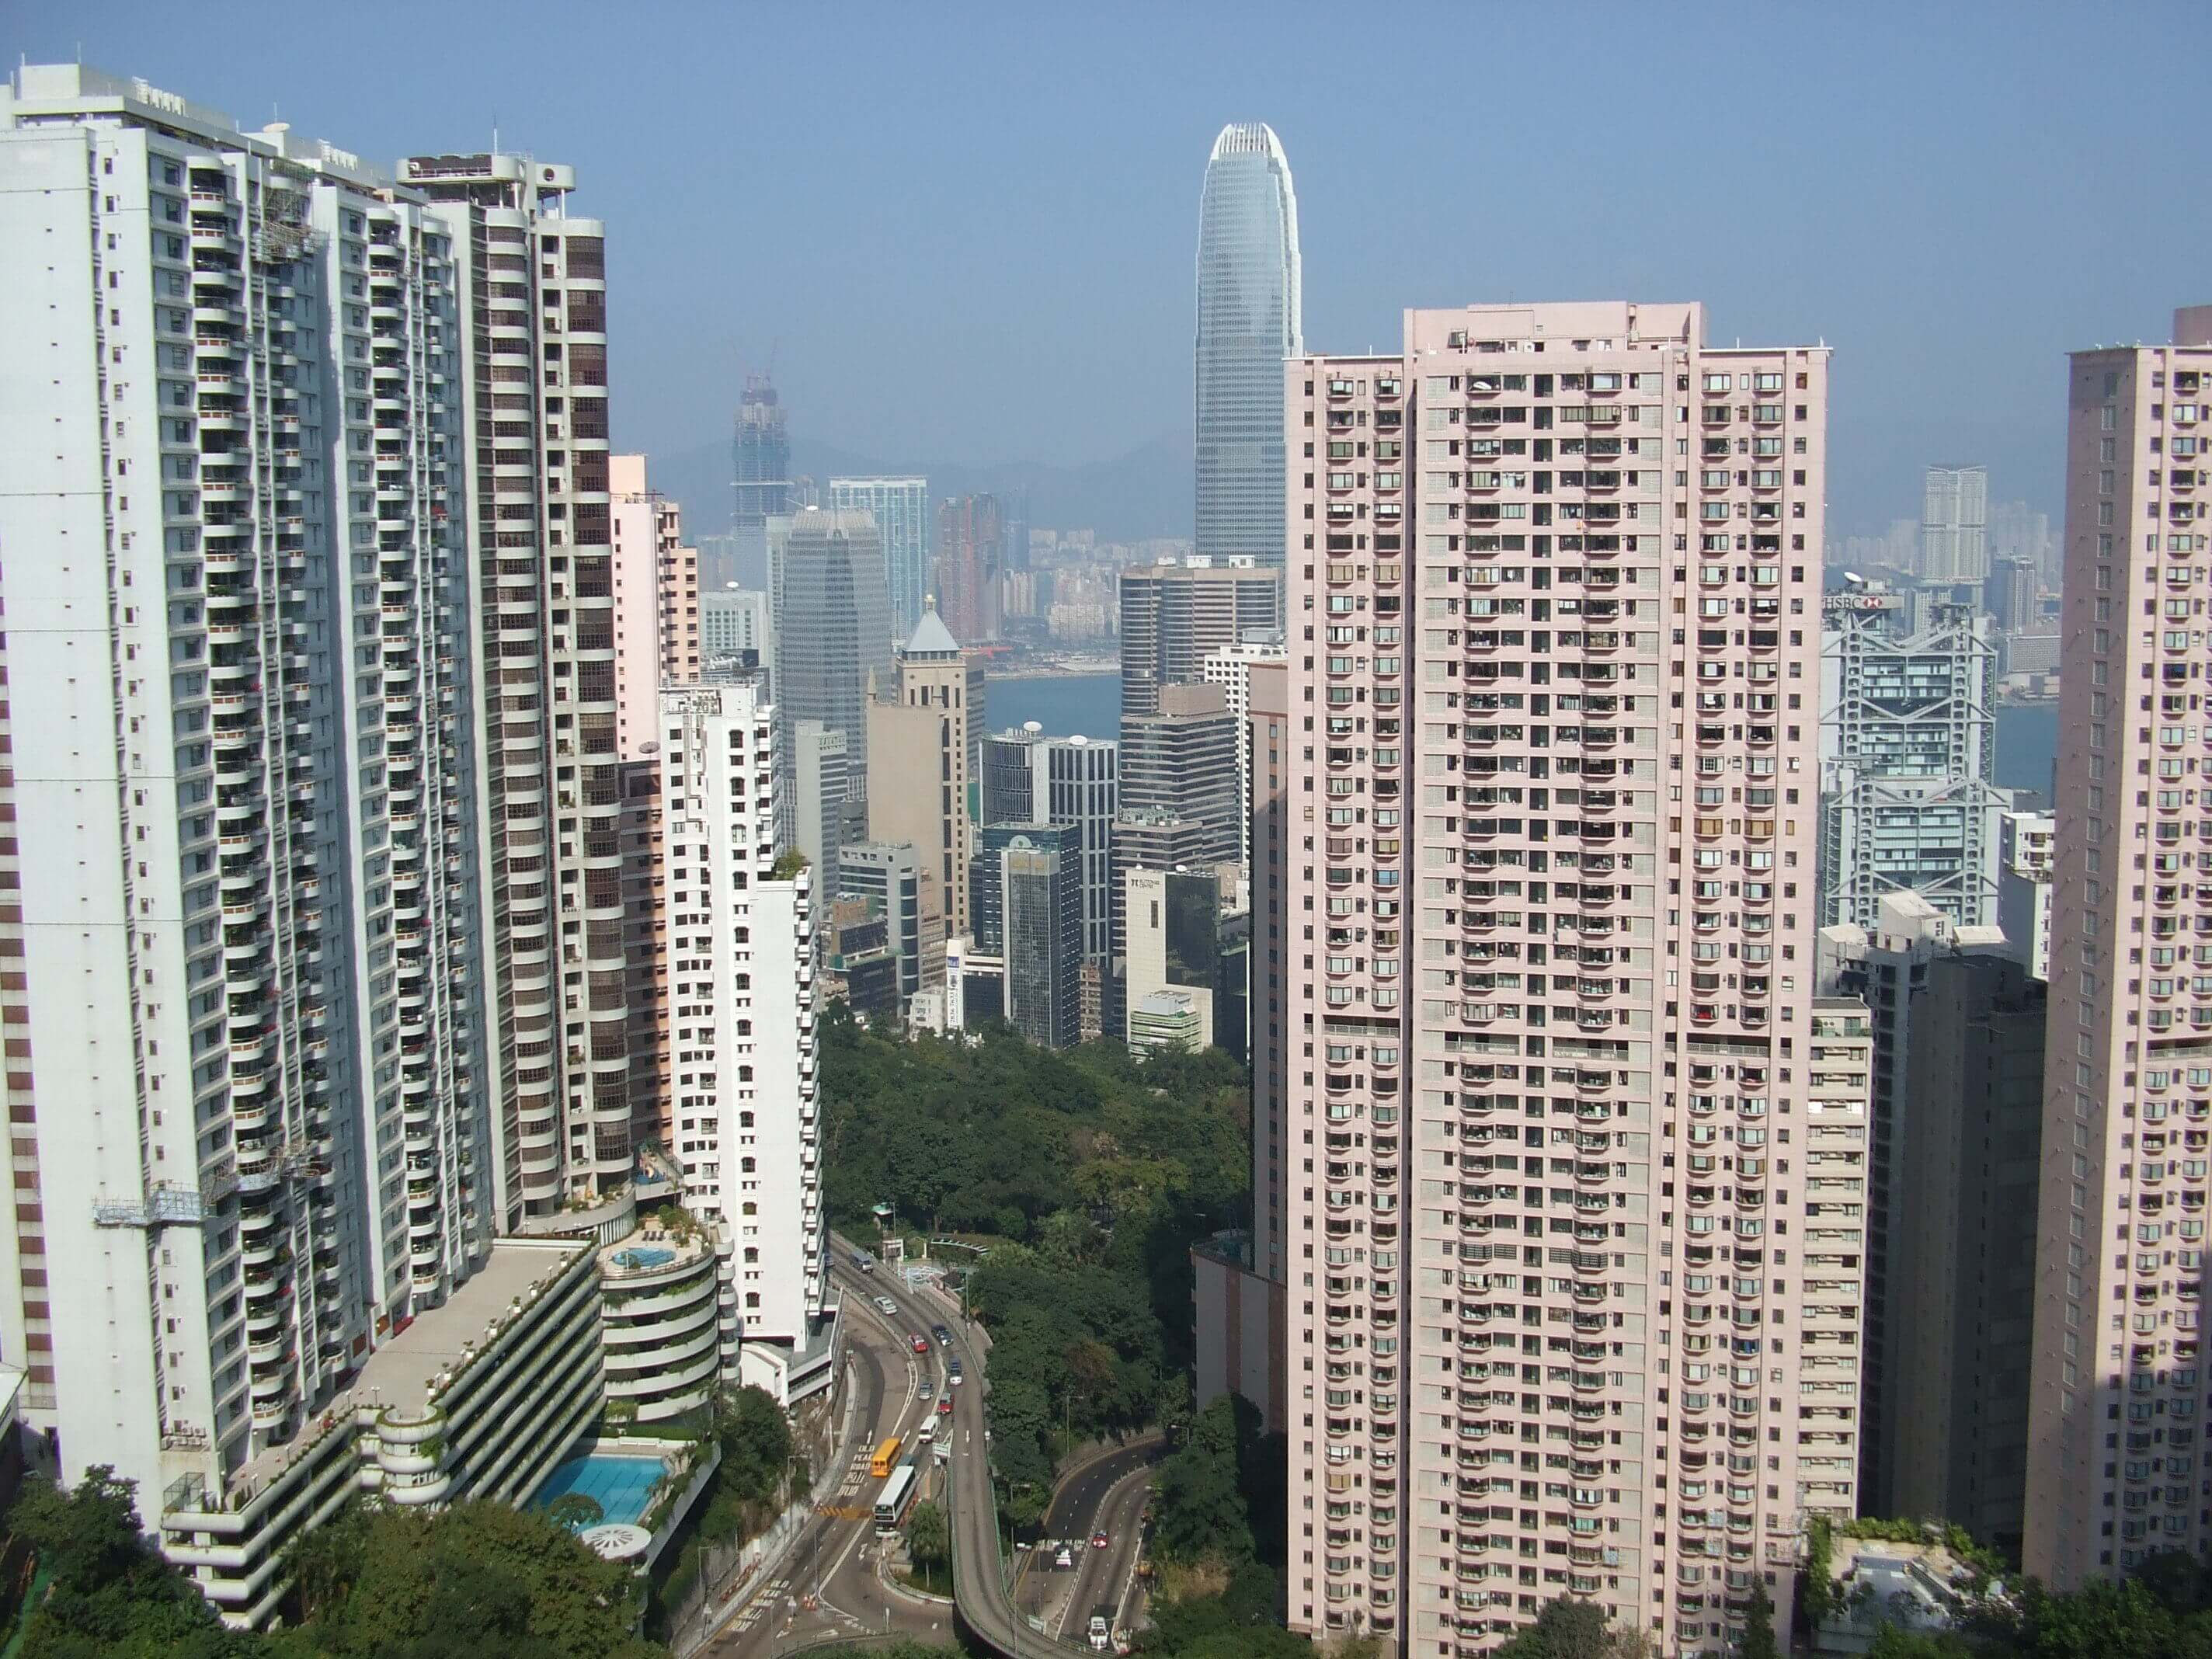 Tieleman Keukens in Hong Kong